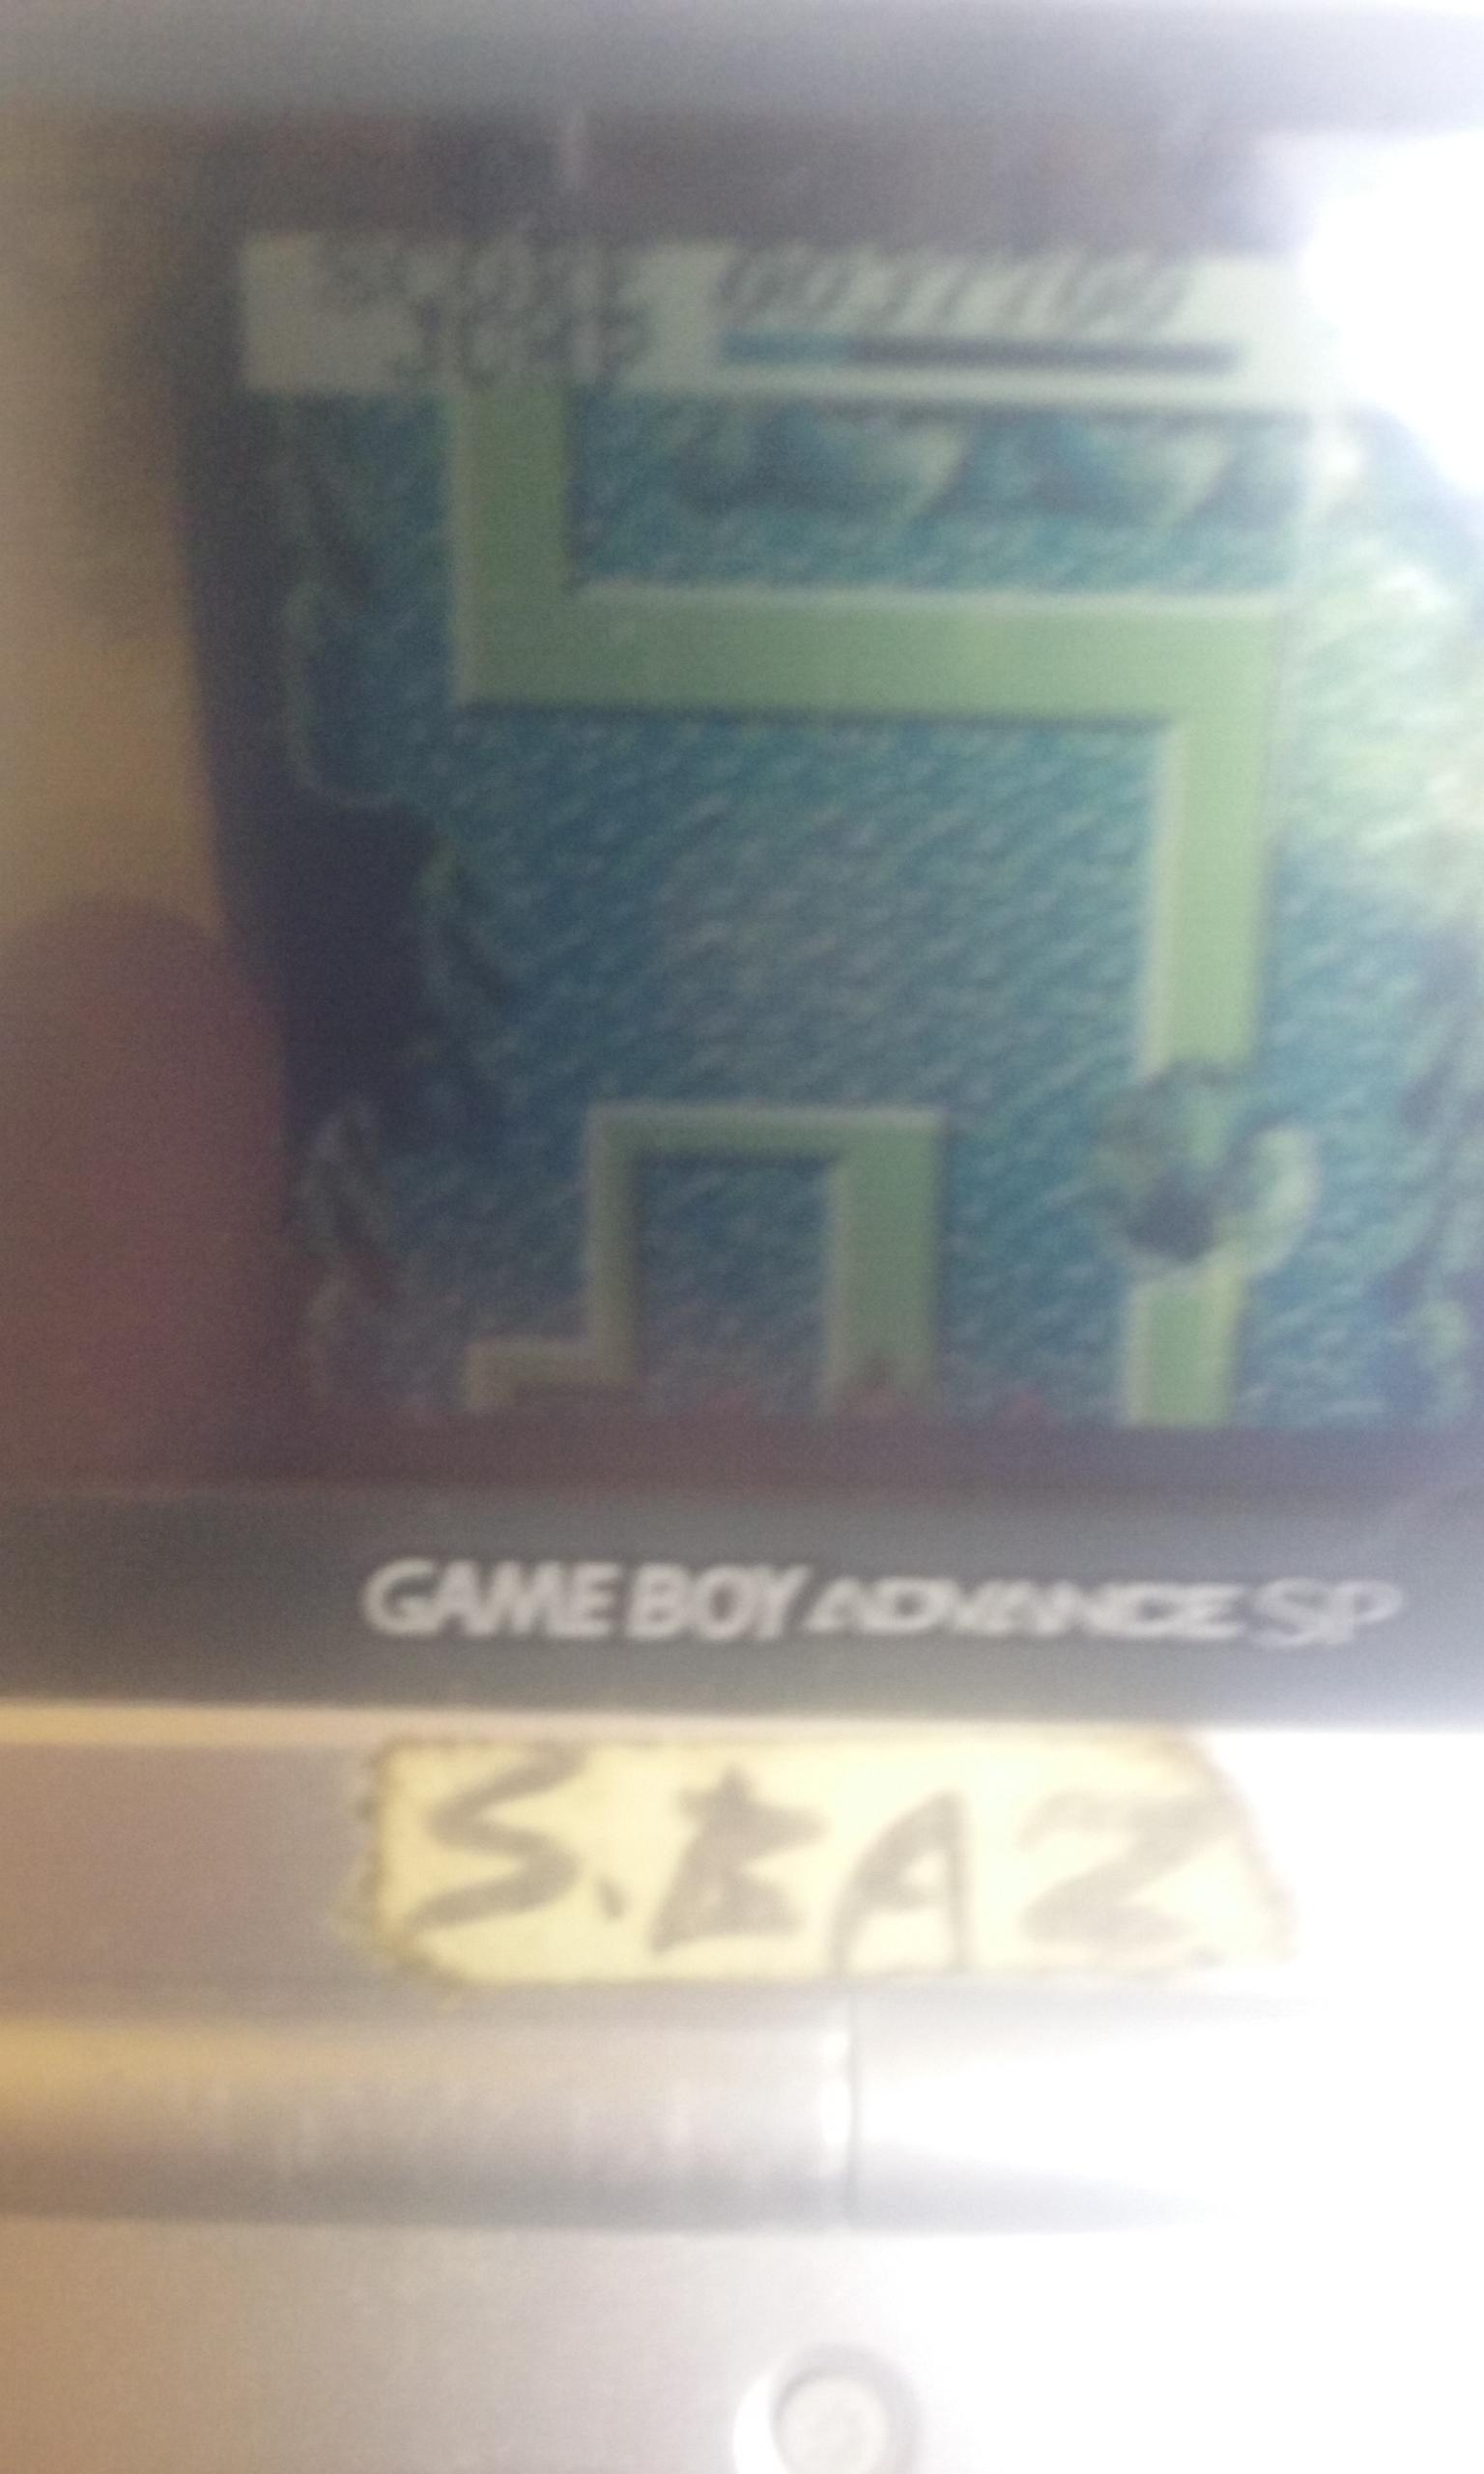 S.BAZ: Aero Star [Easy] (Game Boy) 37,700 points on 2019-11-23 15:23:47